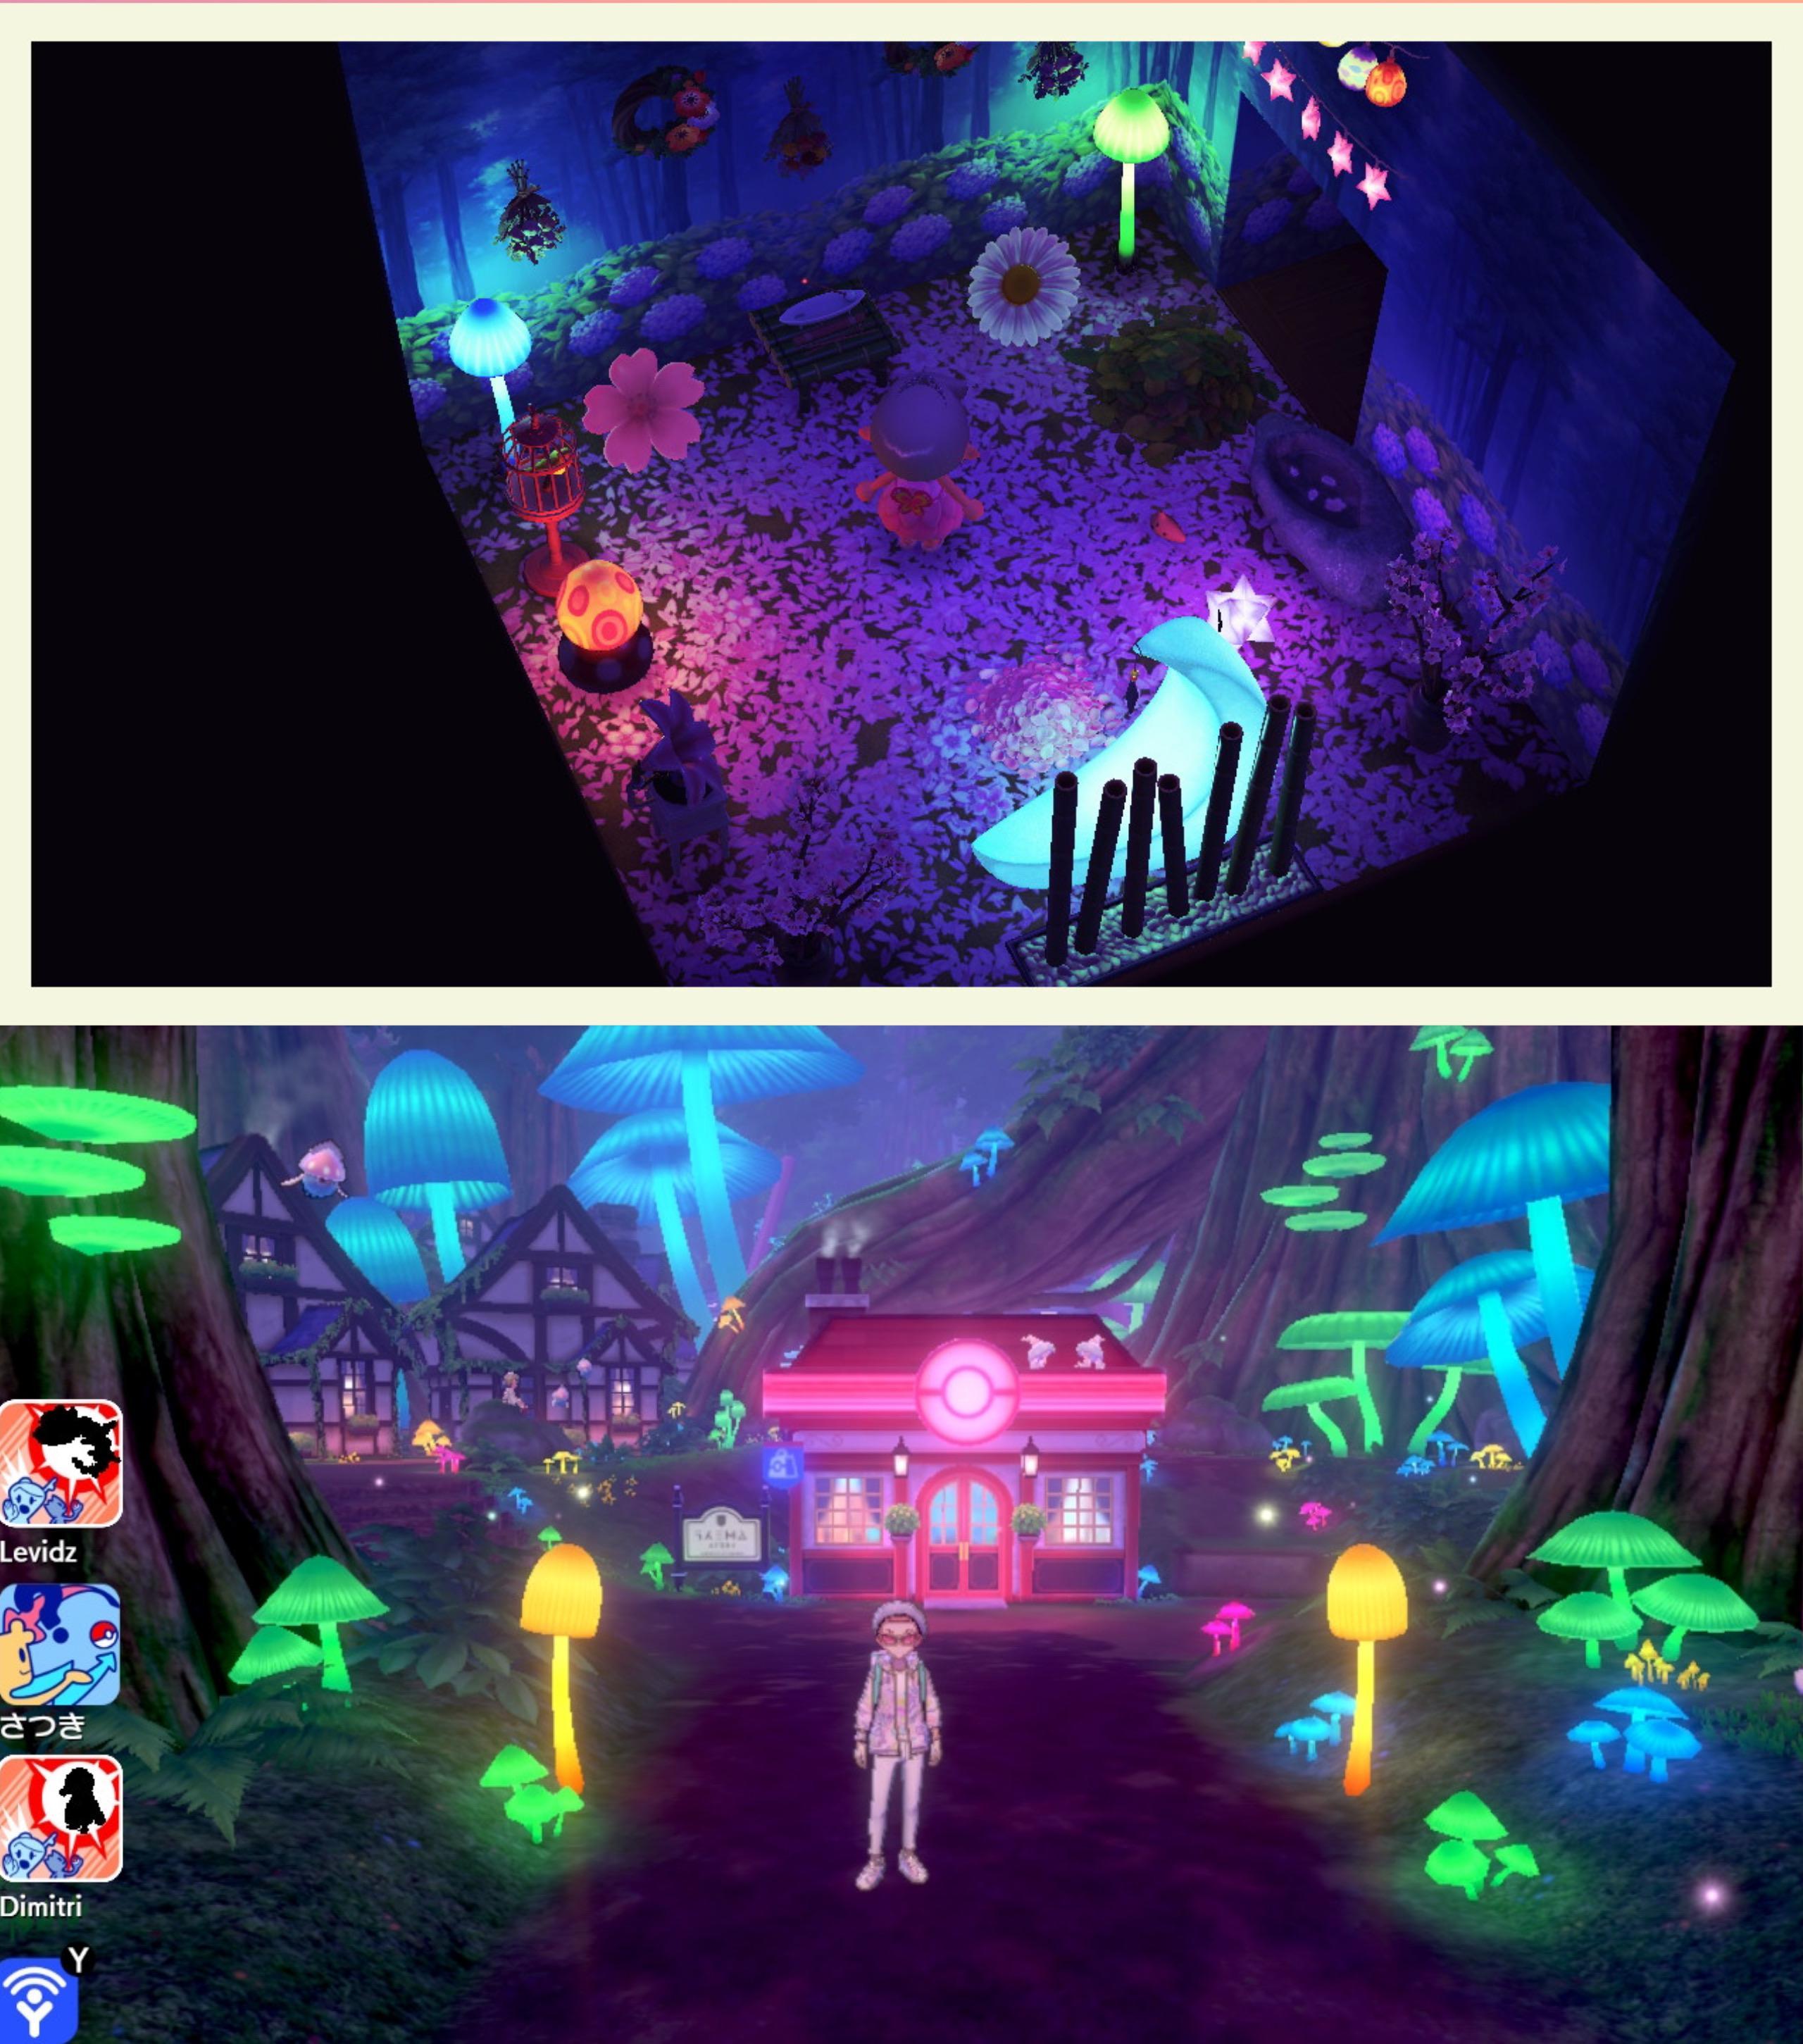 Living Room Ideas Acnh - jihanshanum on Animal Crossing New Horizon Living Room Ideas  id=11542